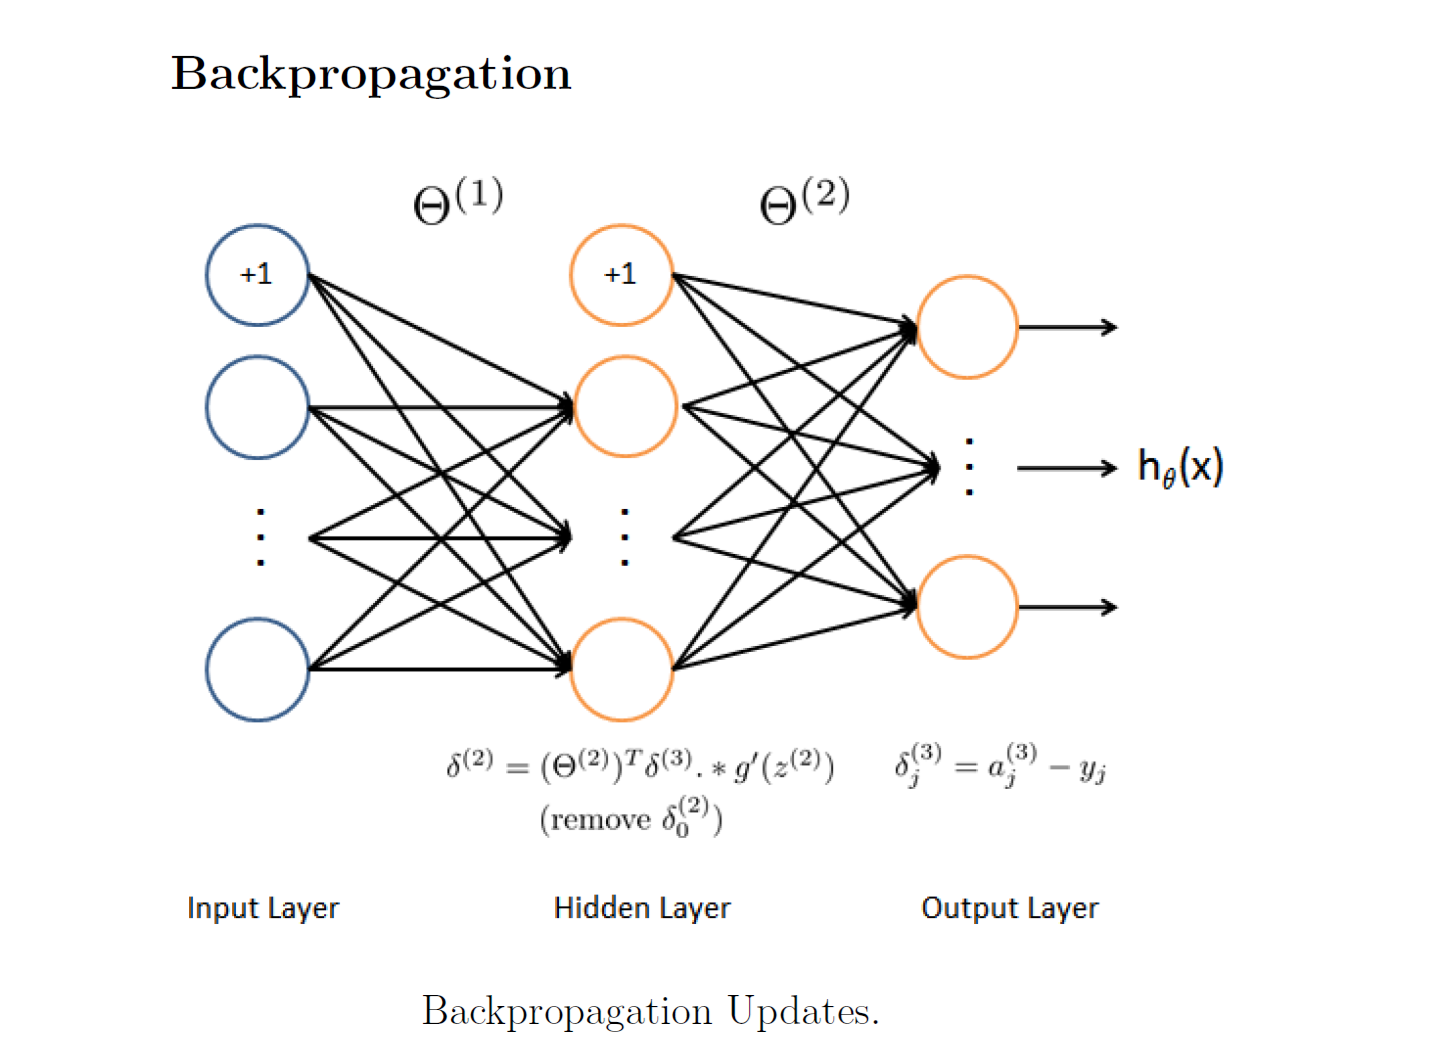 Backprop model